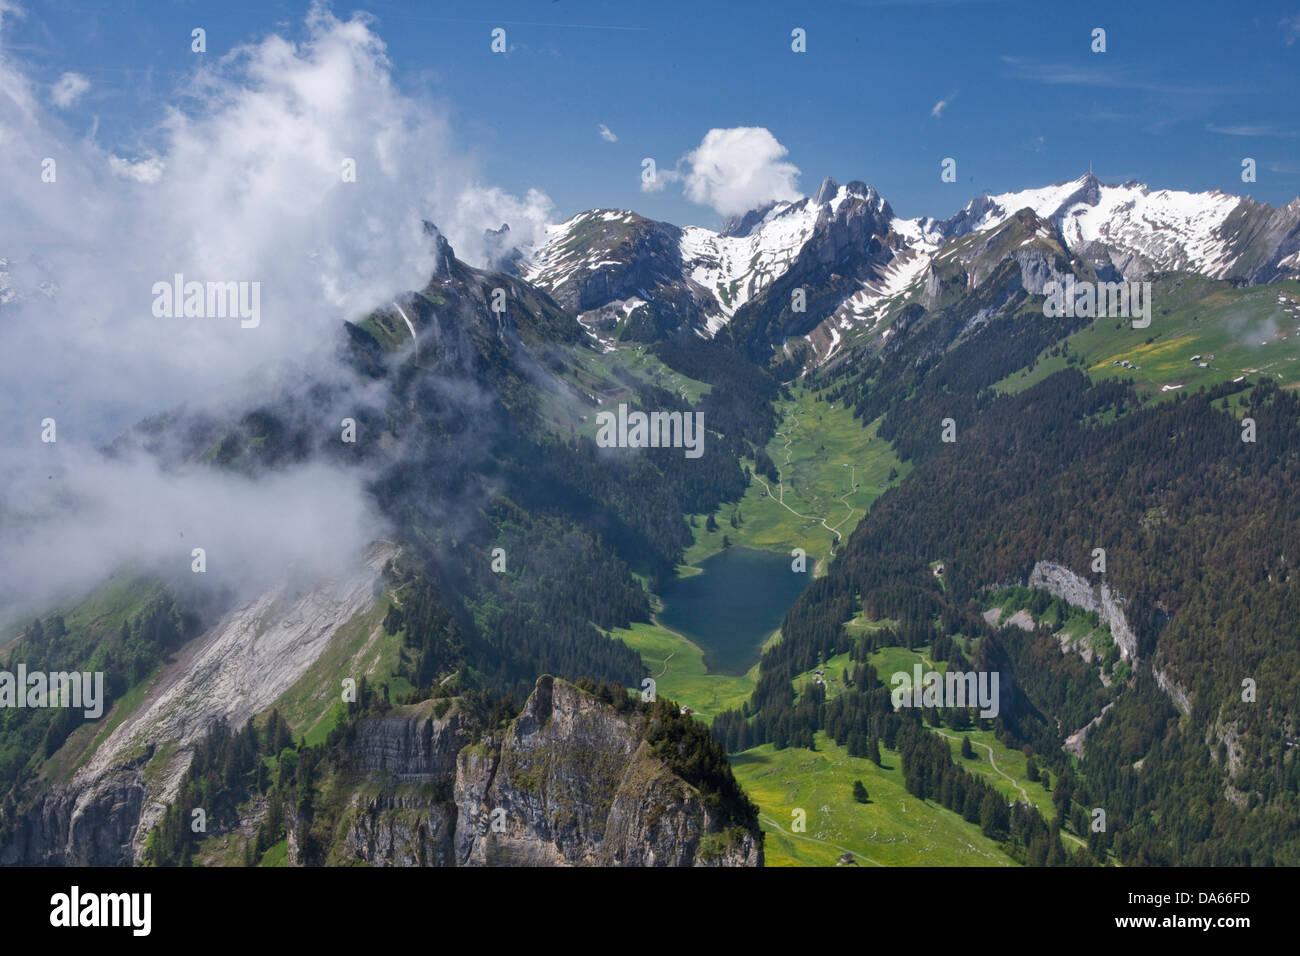 To high castes, box, Alpstein, mountain, mountains, canton, Appenzell, Innerroden, Appenzell area, Alpstein, Säntis, - Stock Image